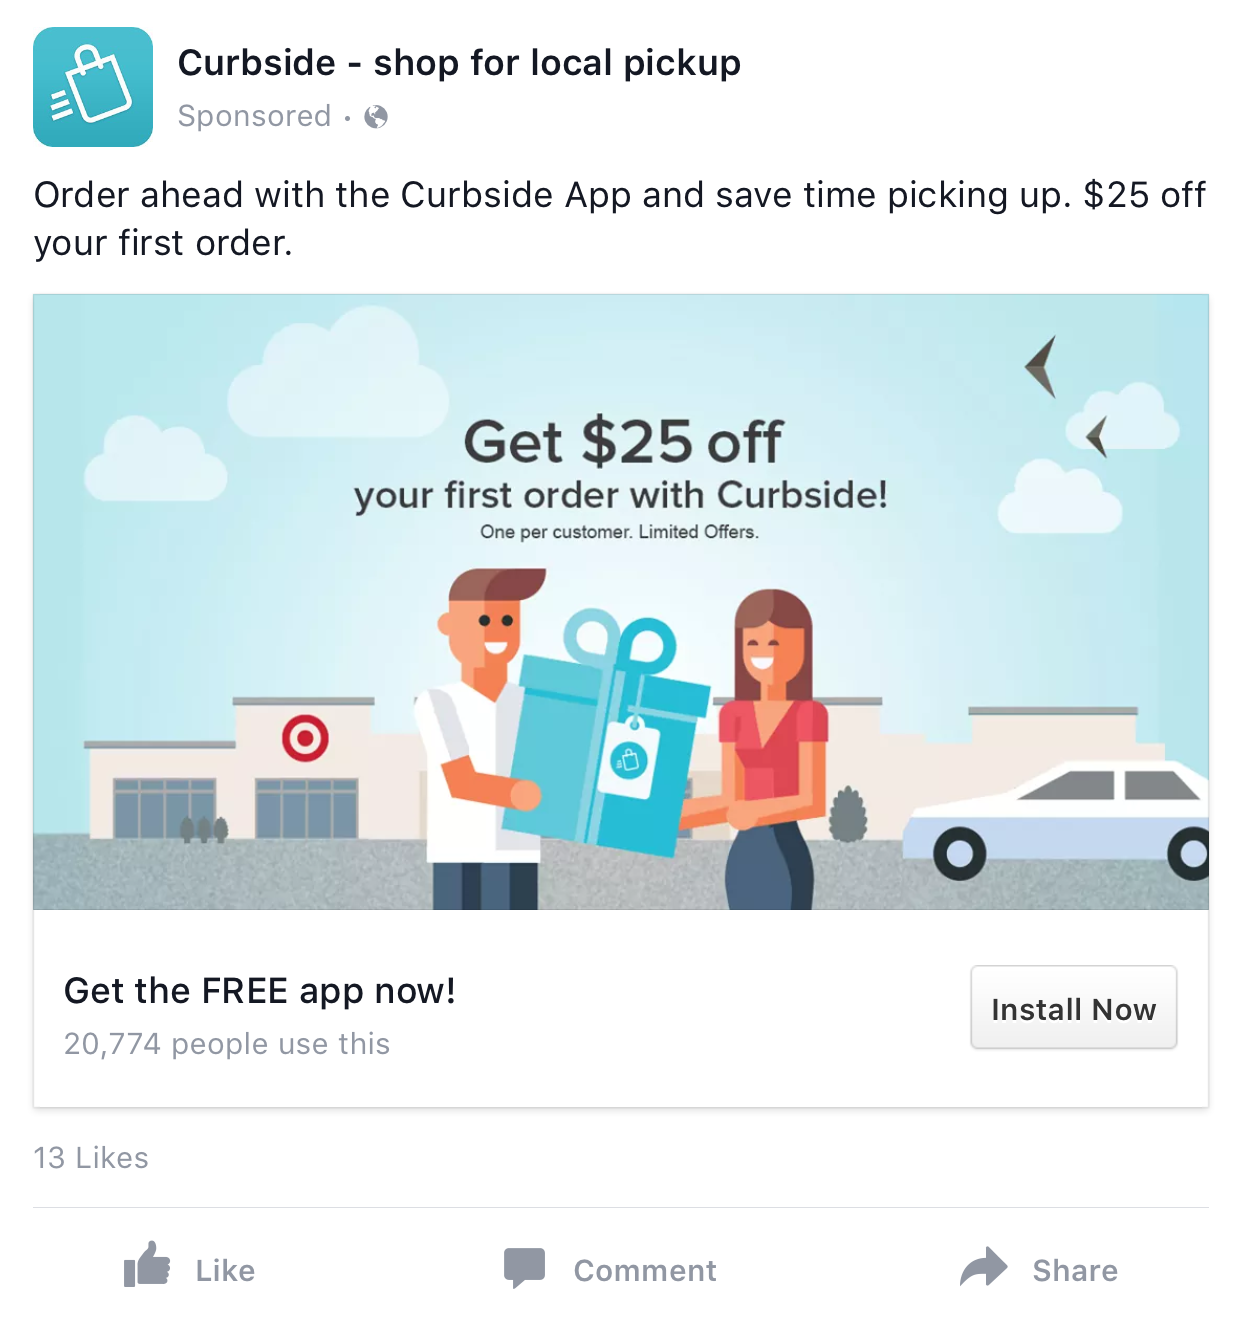 facebook app install ad example facebook app install ad examples facebook app install ad example